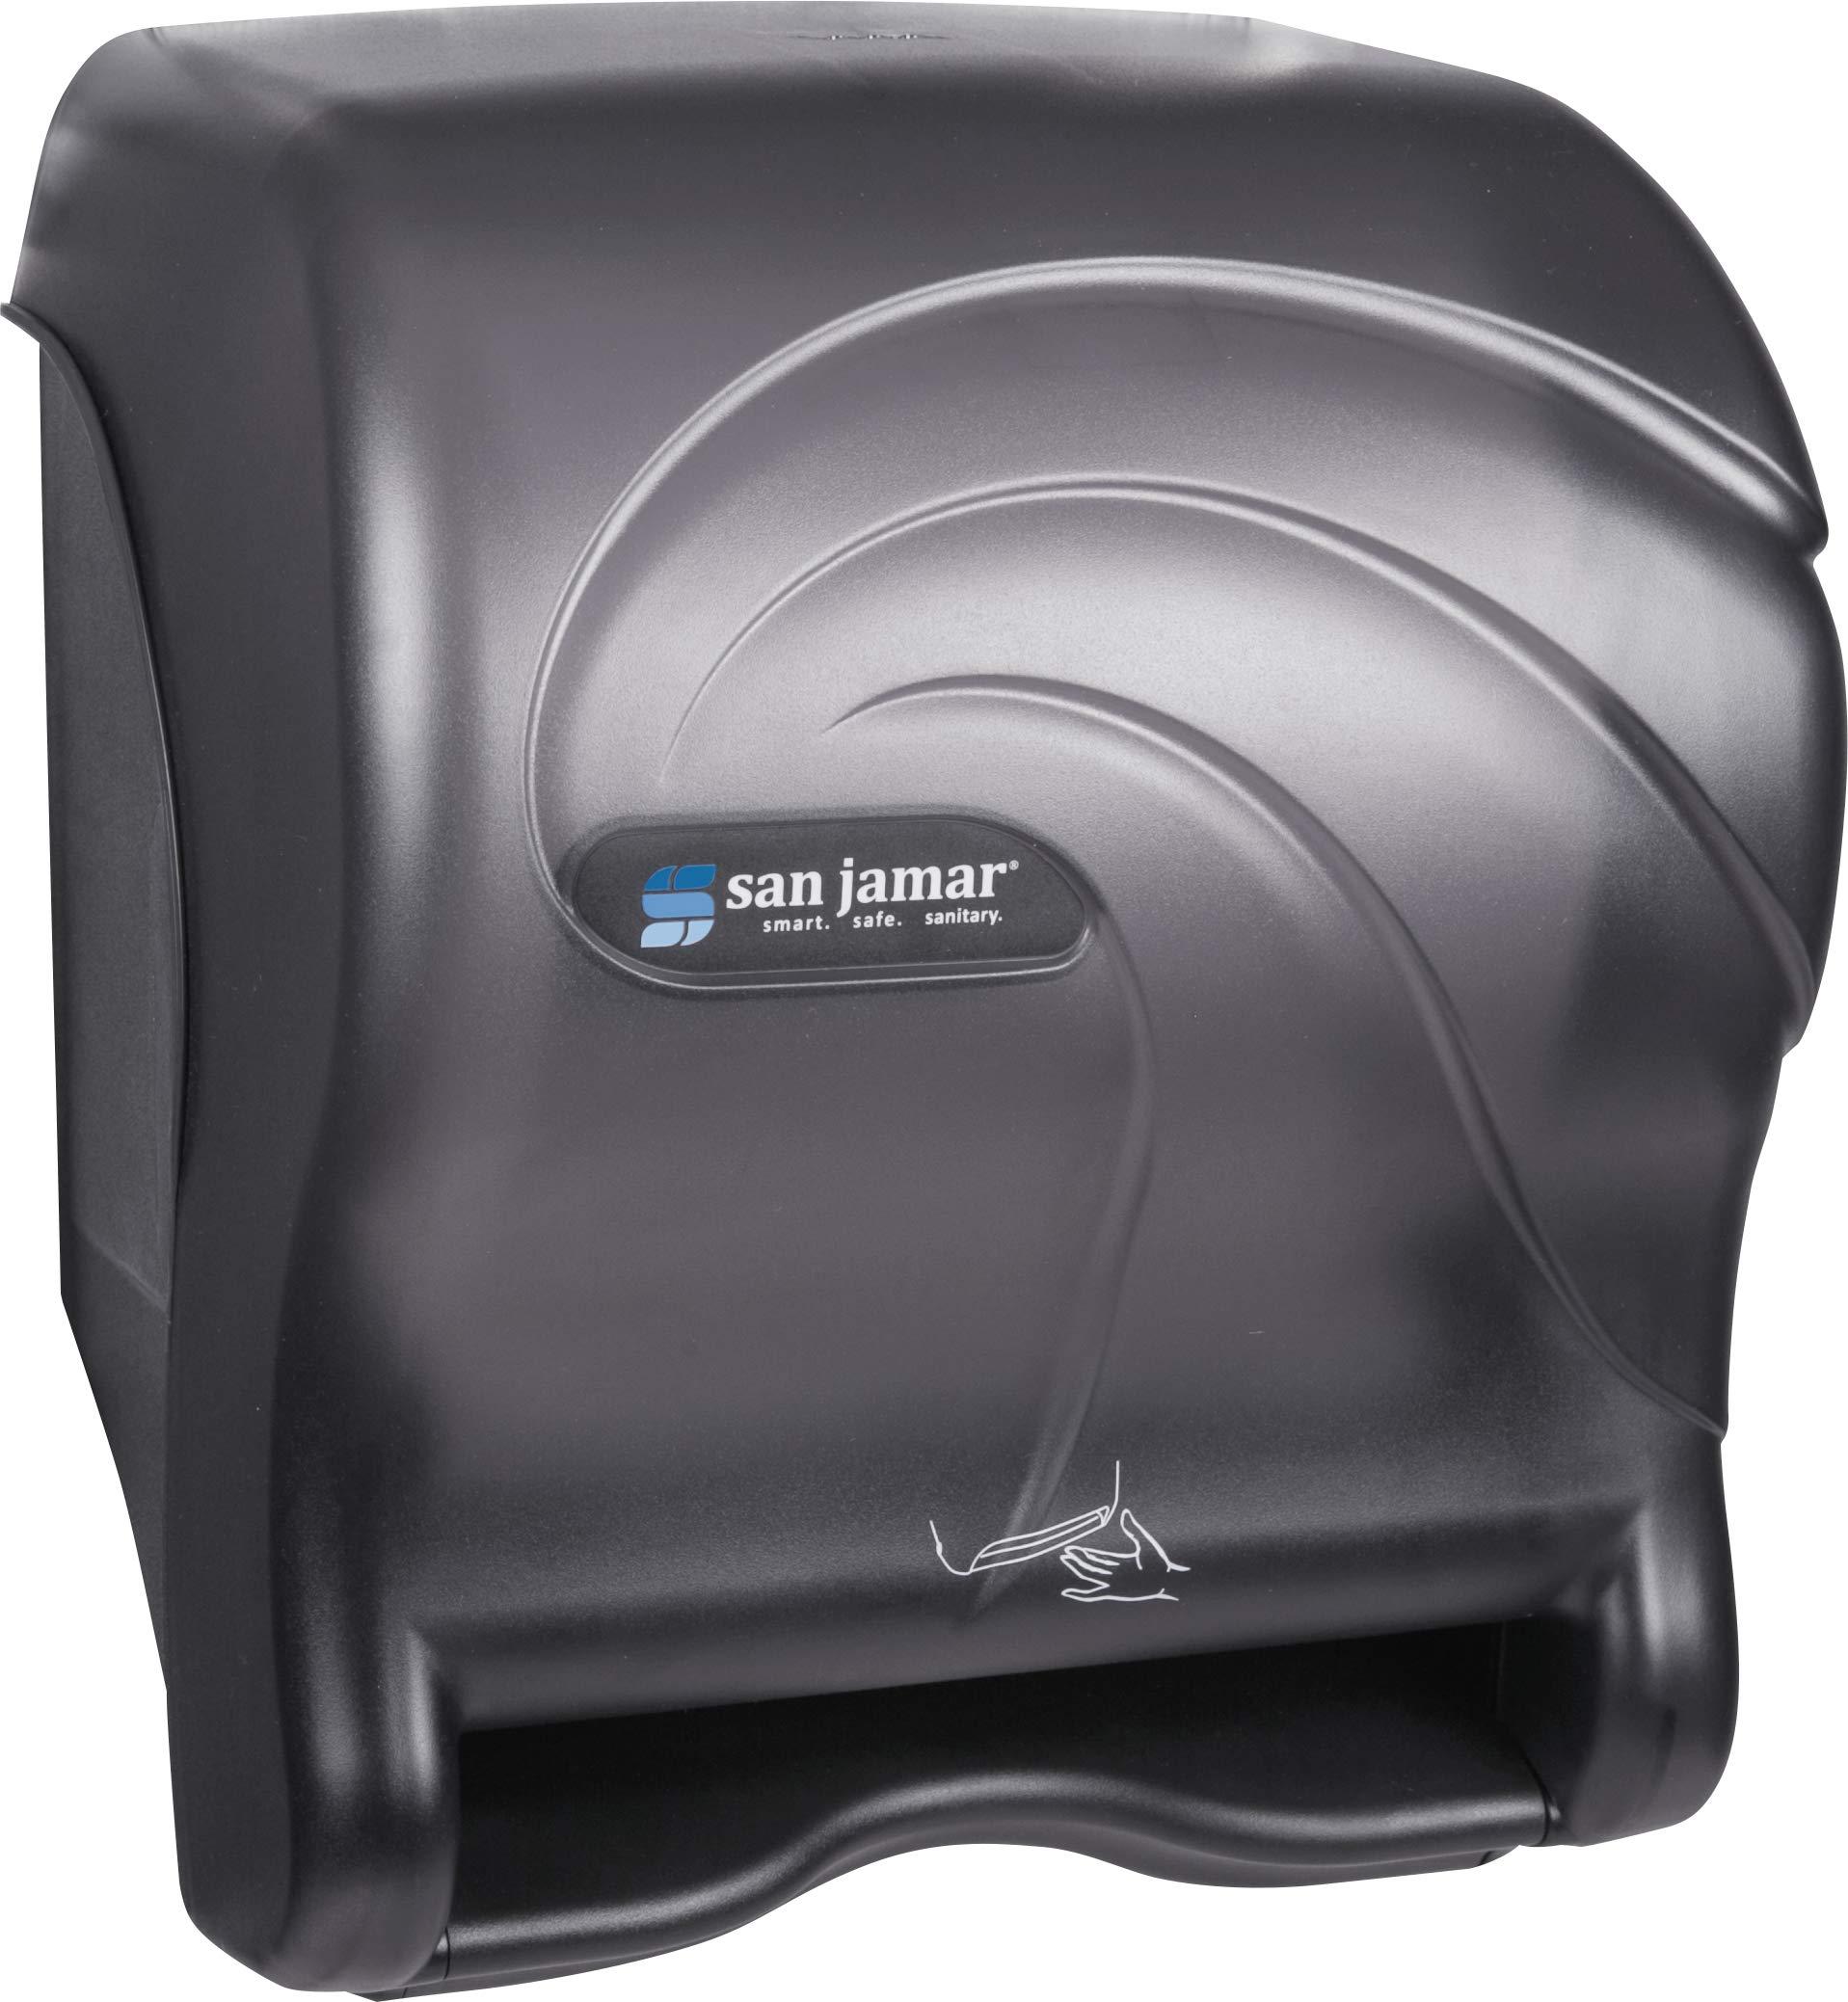 San Jamar T8490TBK Smart Essence Oceans Hands Free Paper Towel Dispenser, Black Pearl by San Jamar (Image #6)